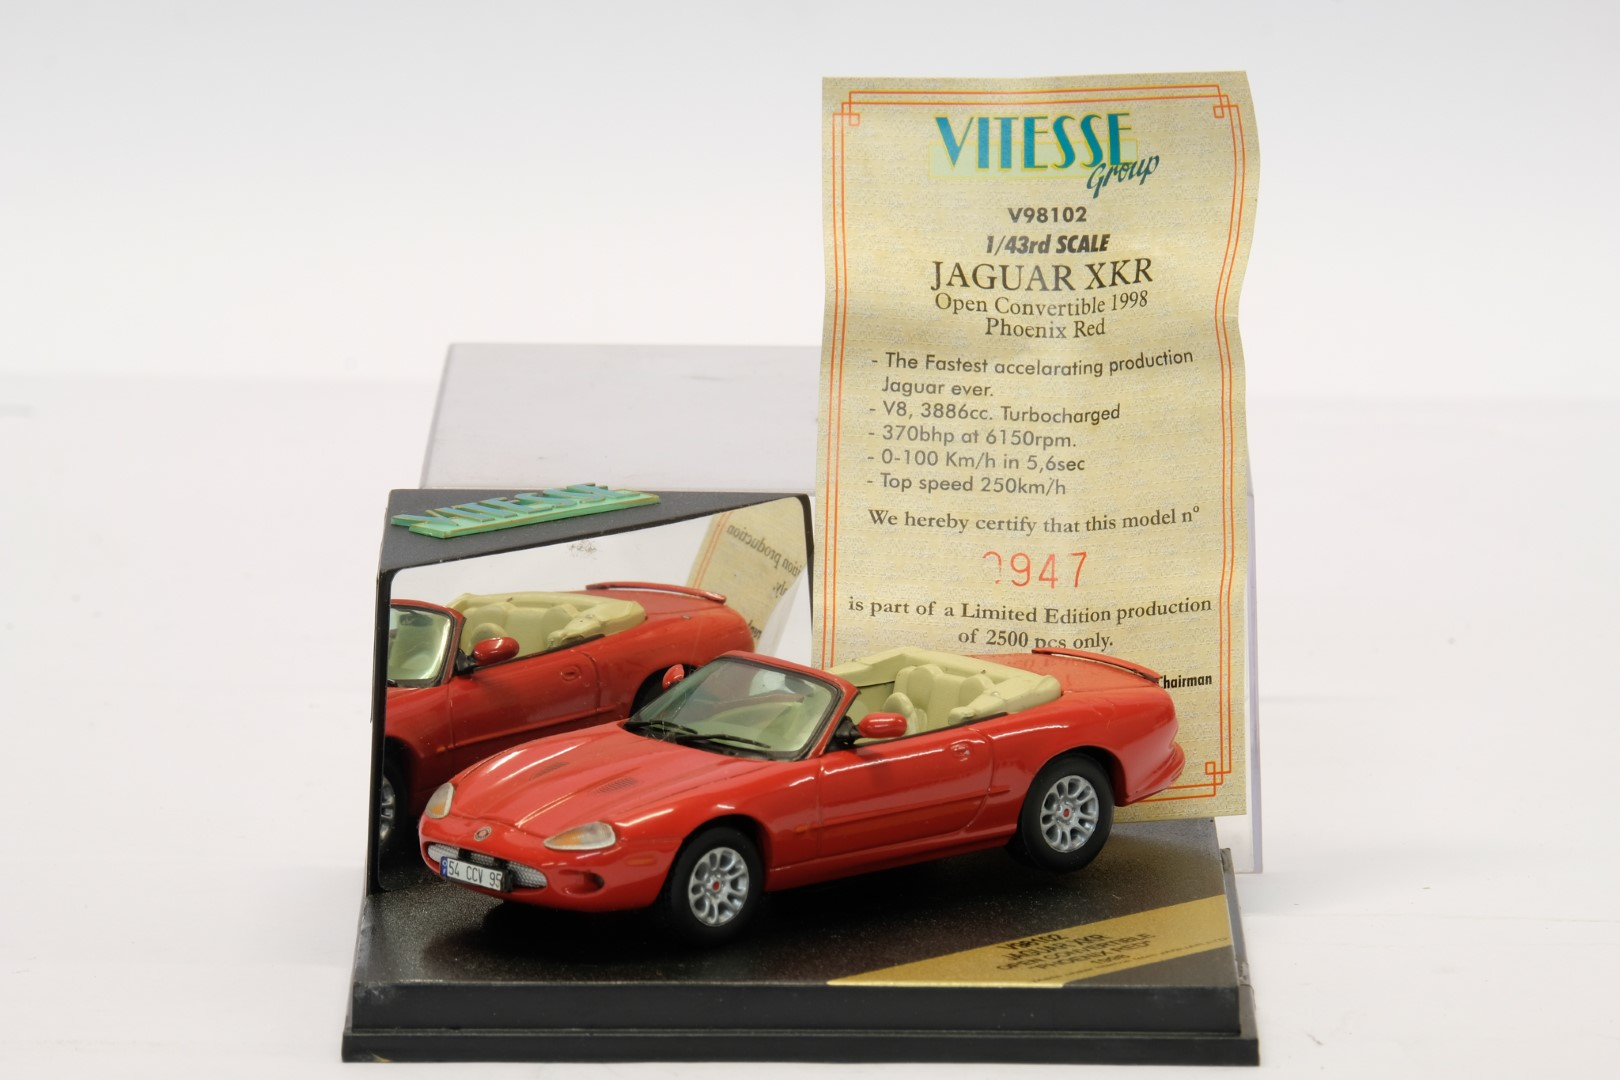 Vitesse Jaguar XKR Open Convertible 1998 Red - Image 2 of 2